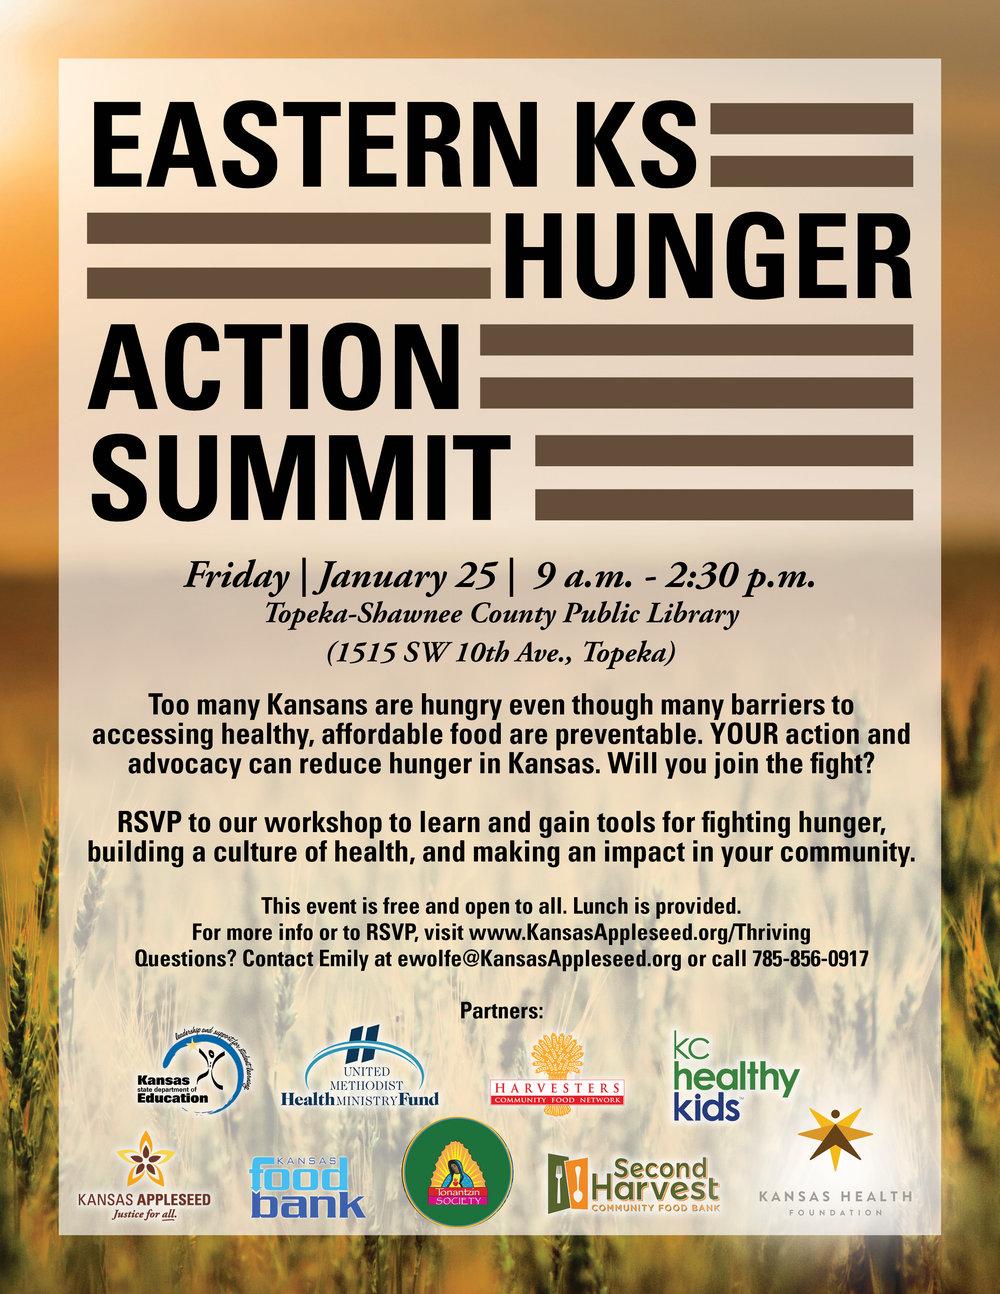 Topeka_Hunger Action Summit_Flier.jpg